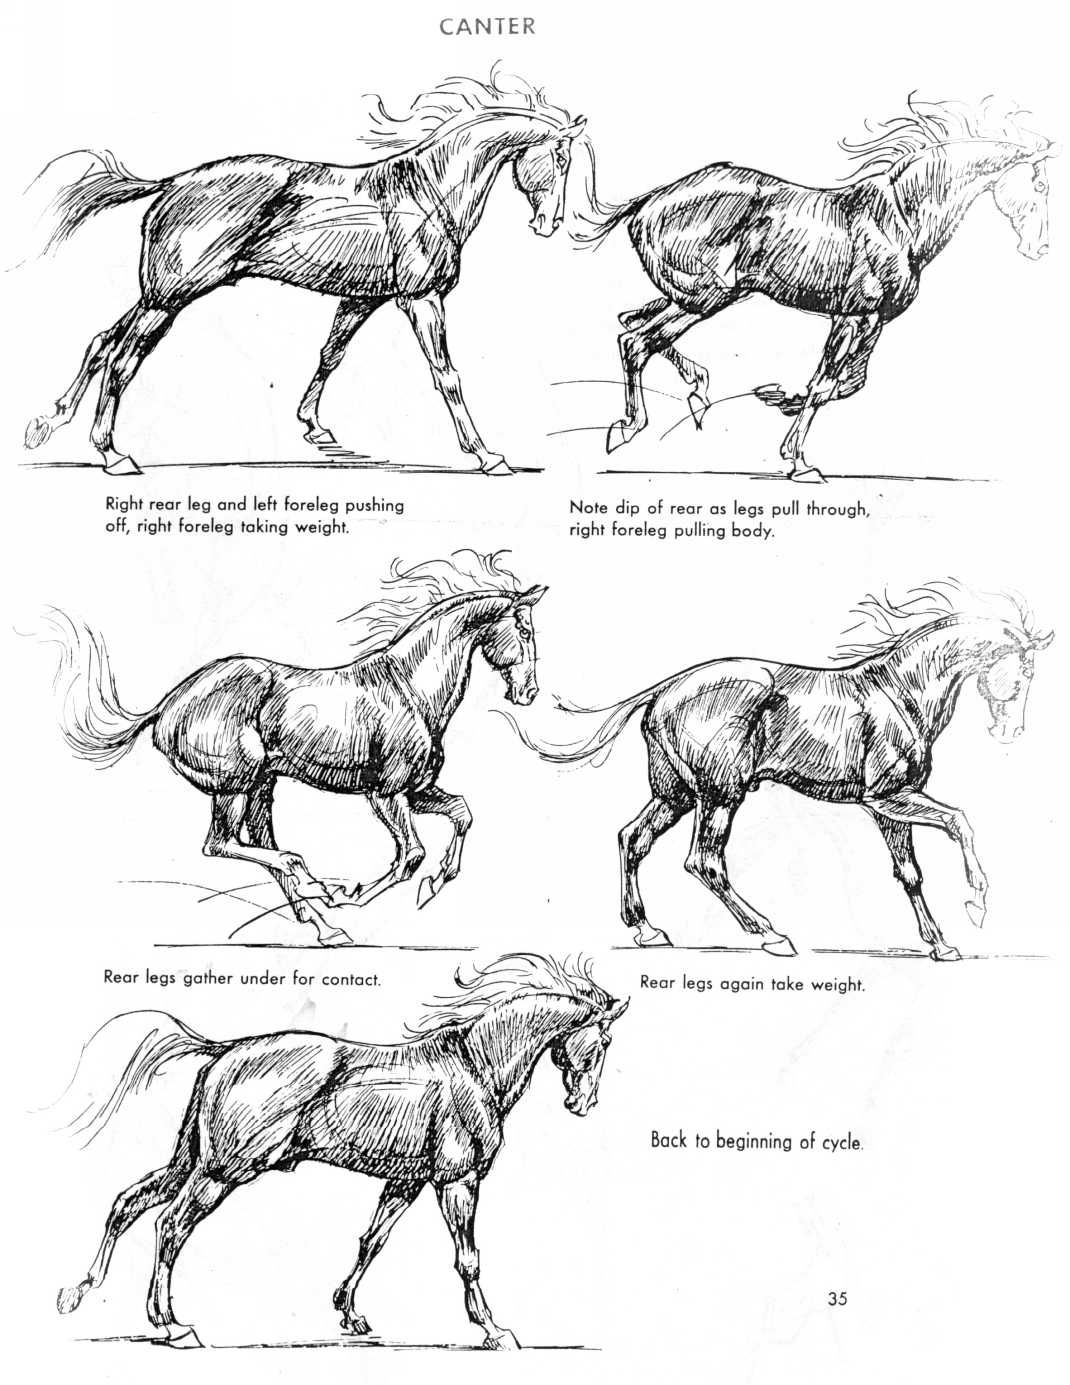 The Art of Animal Drawing by Ken Hultgren | Drawing | Pinterest ...